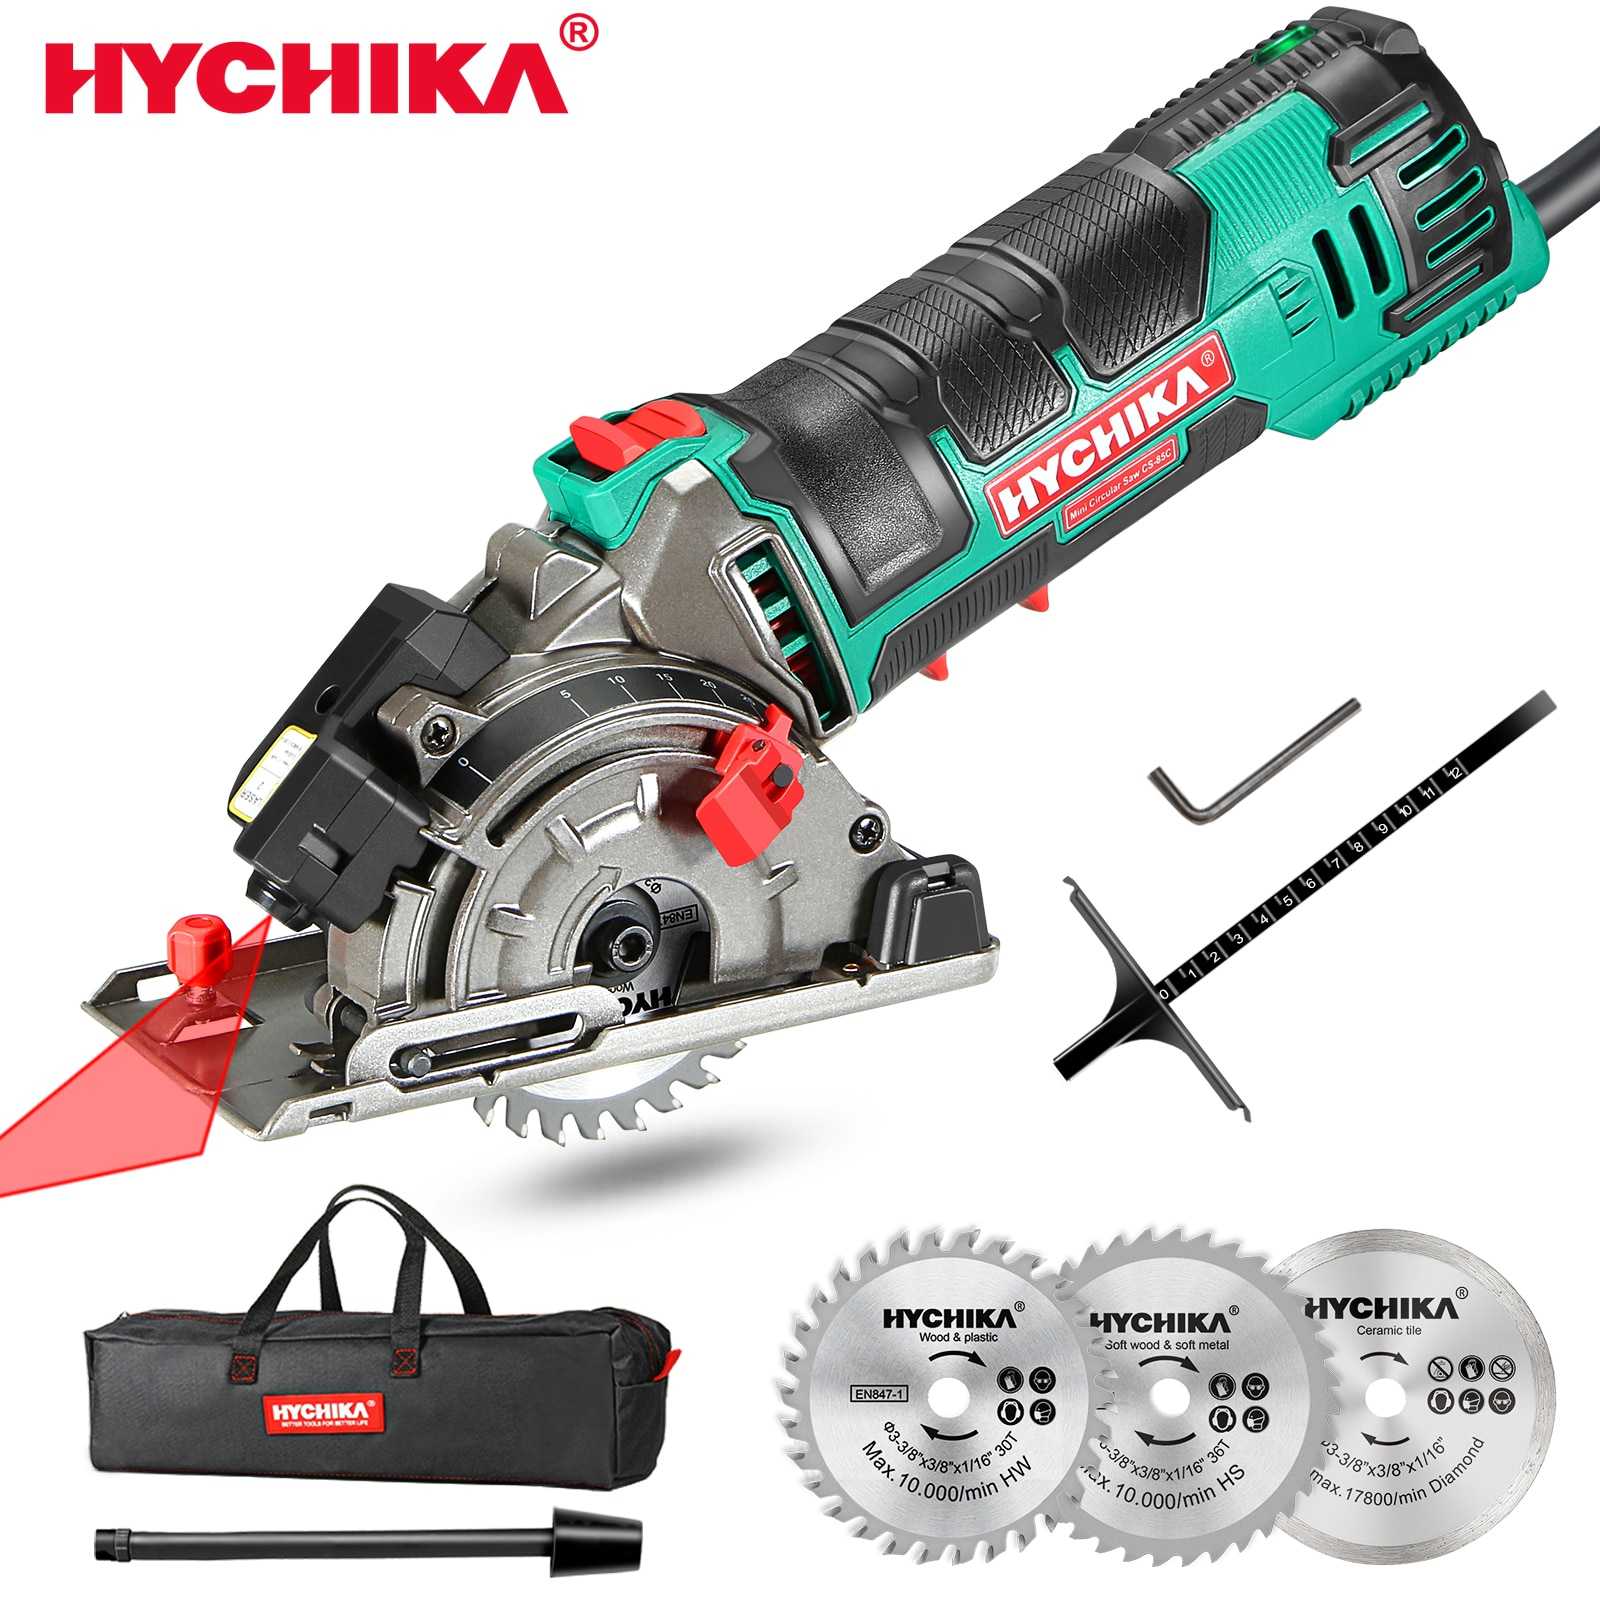 HYCHIKA 500W Electric Mini Circular Saw With Laser 120V 220V Multifunctional Electric Saw DIY Power